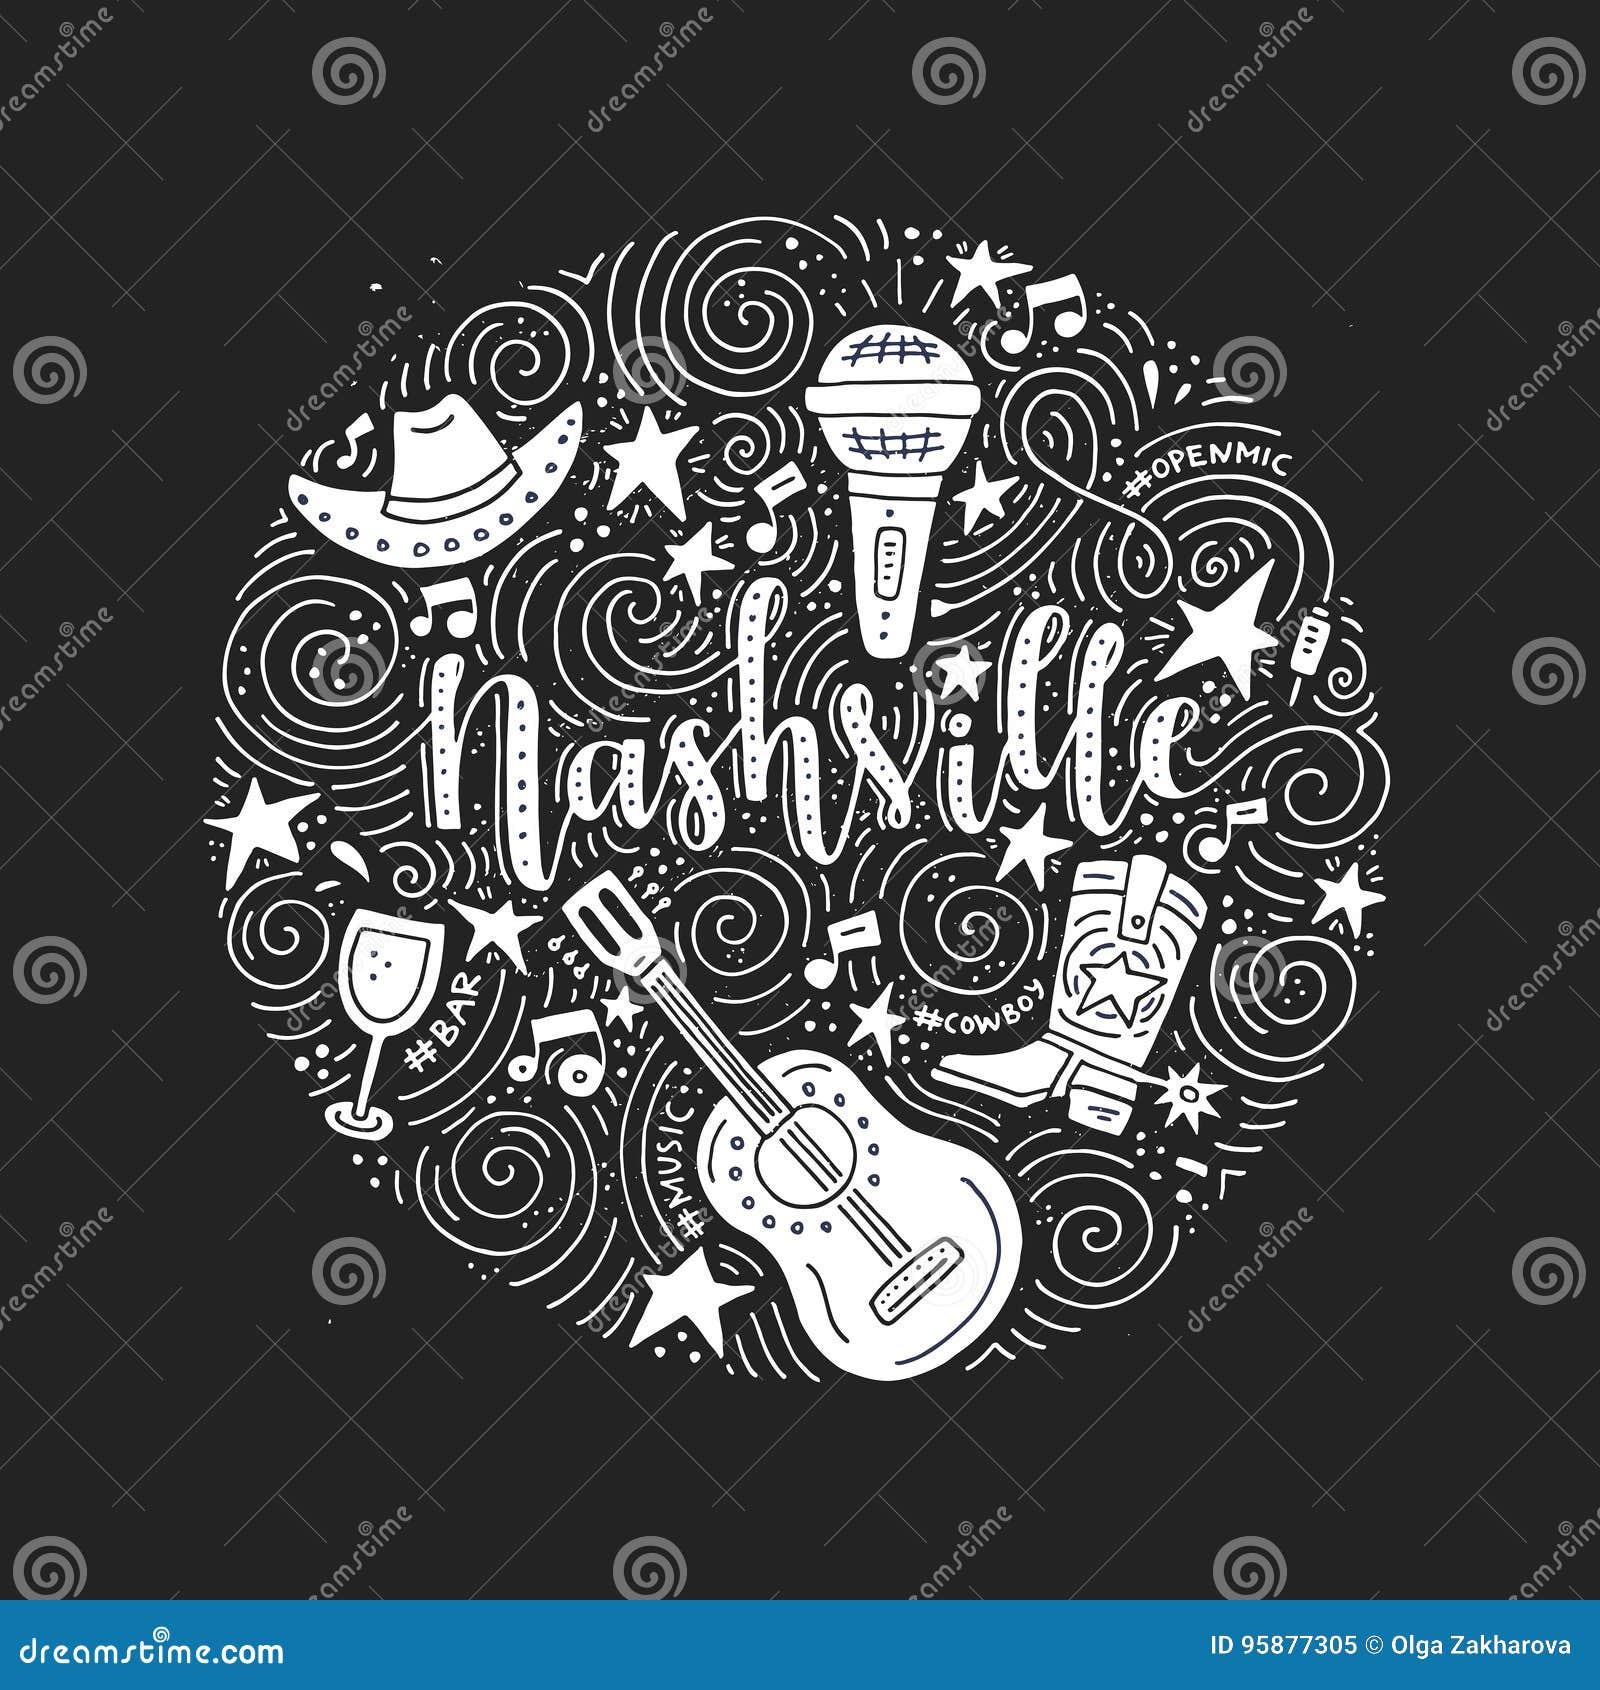 The Symbols Of Nashville Stock Vector Illustration Of Concert